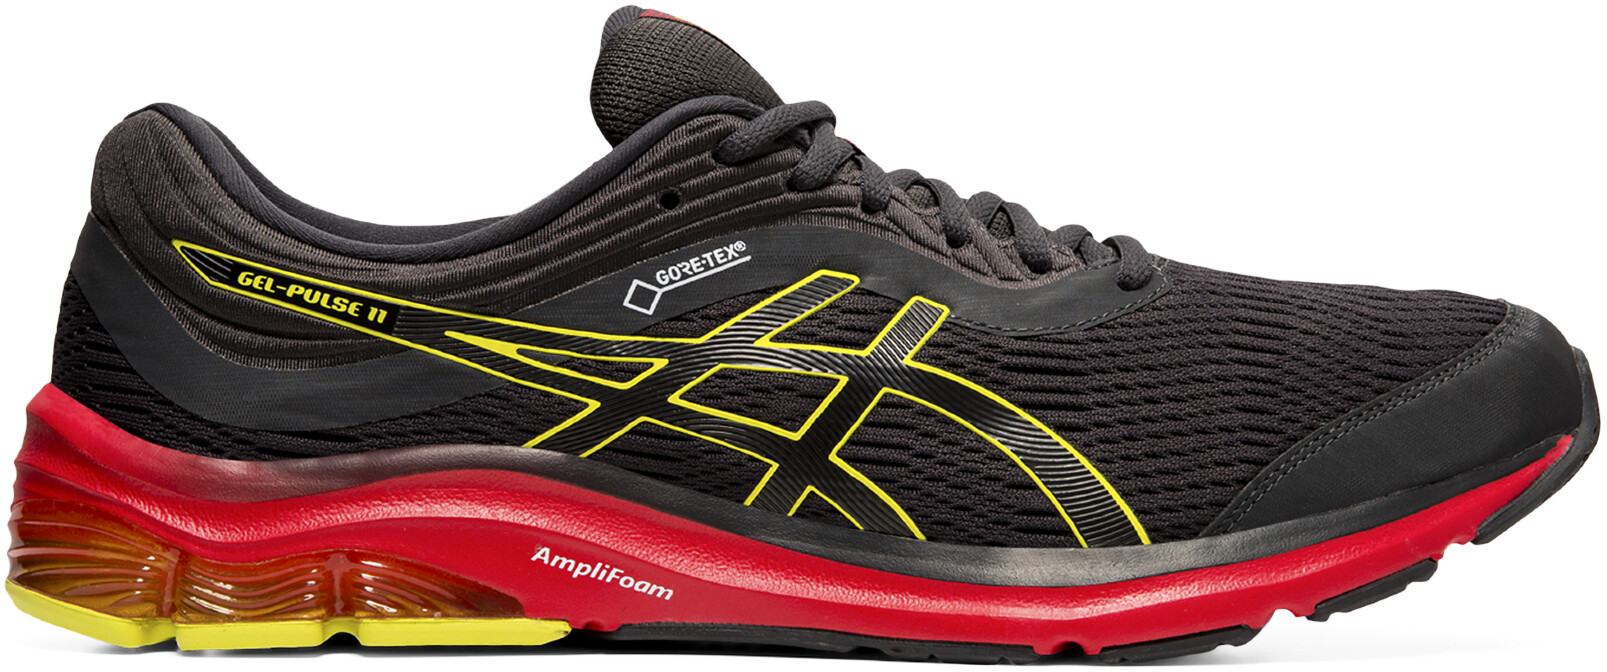 asics Gel Pulse 11 G TX Shoes Men graphite greysour yuzu